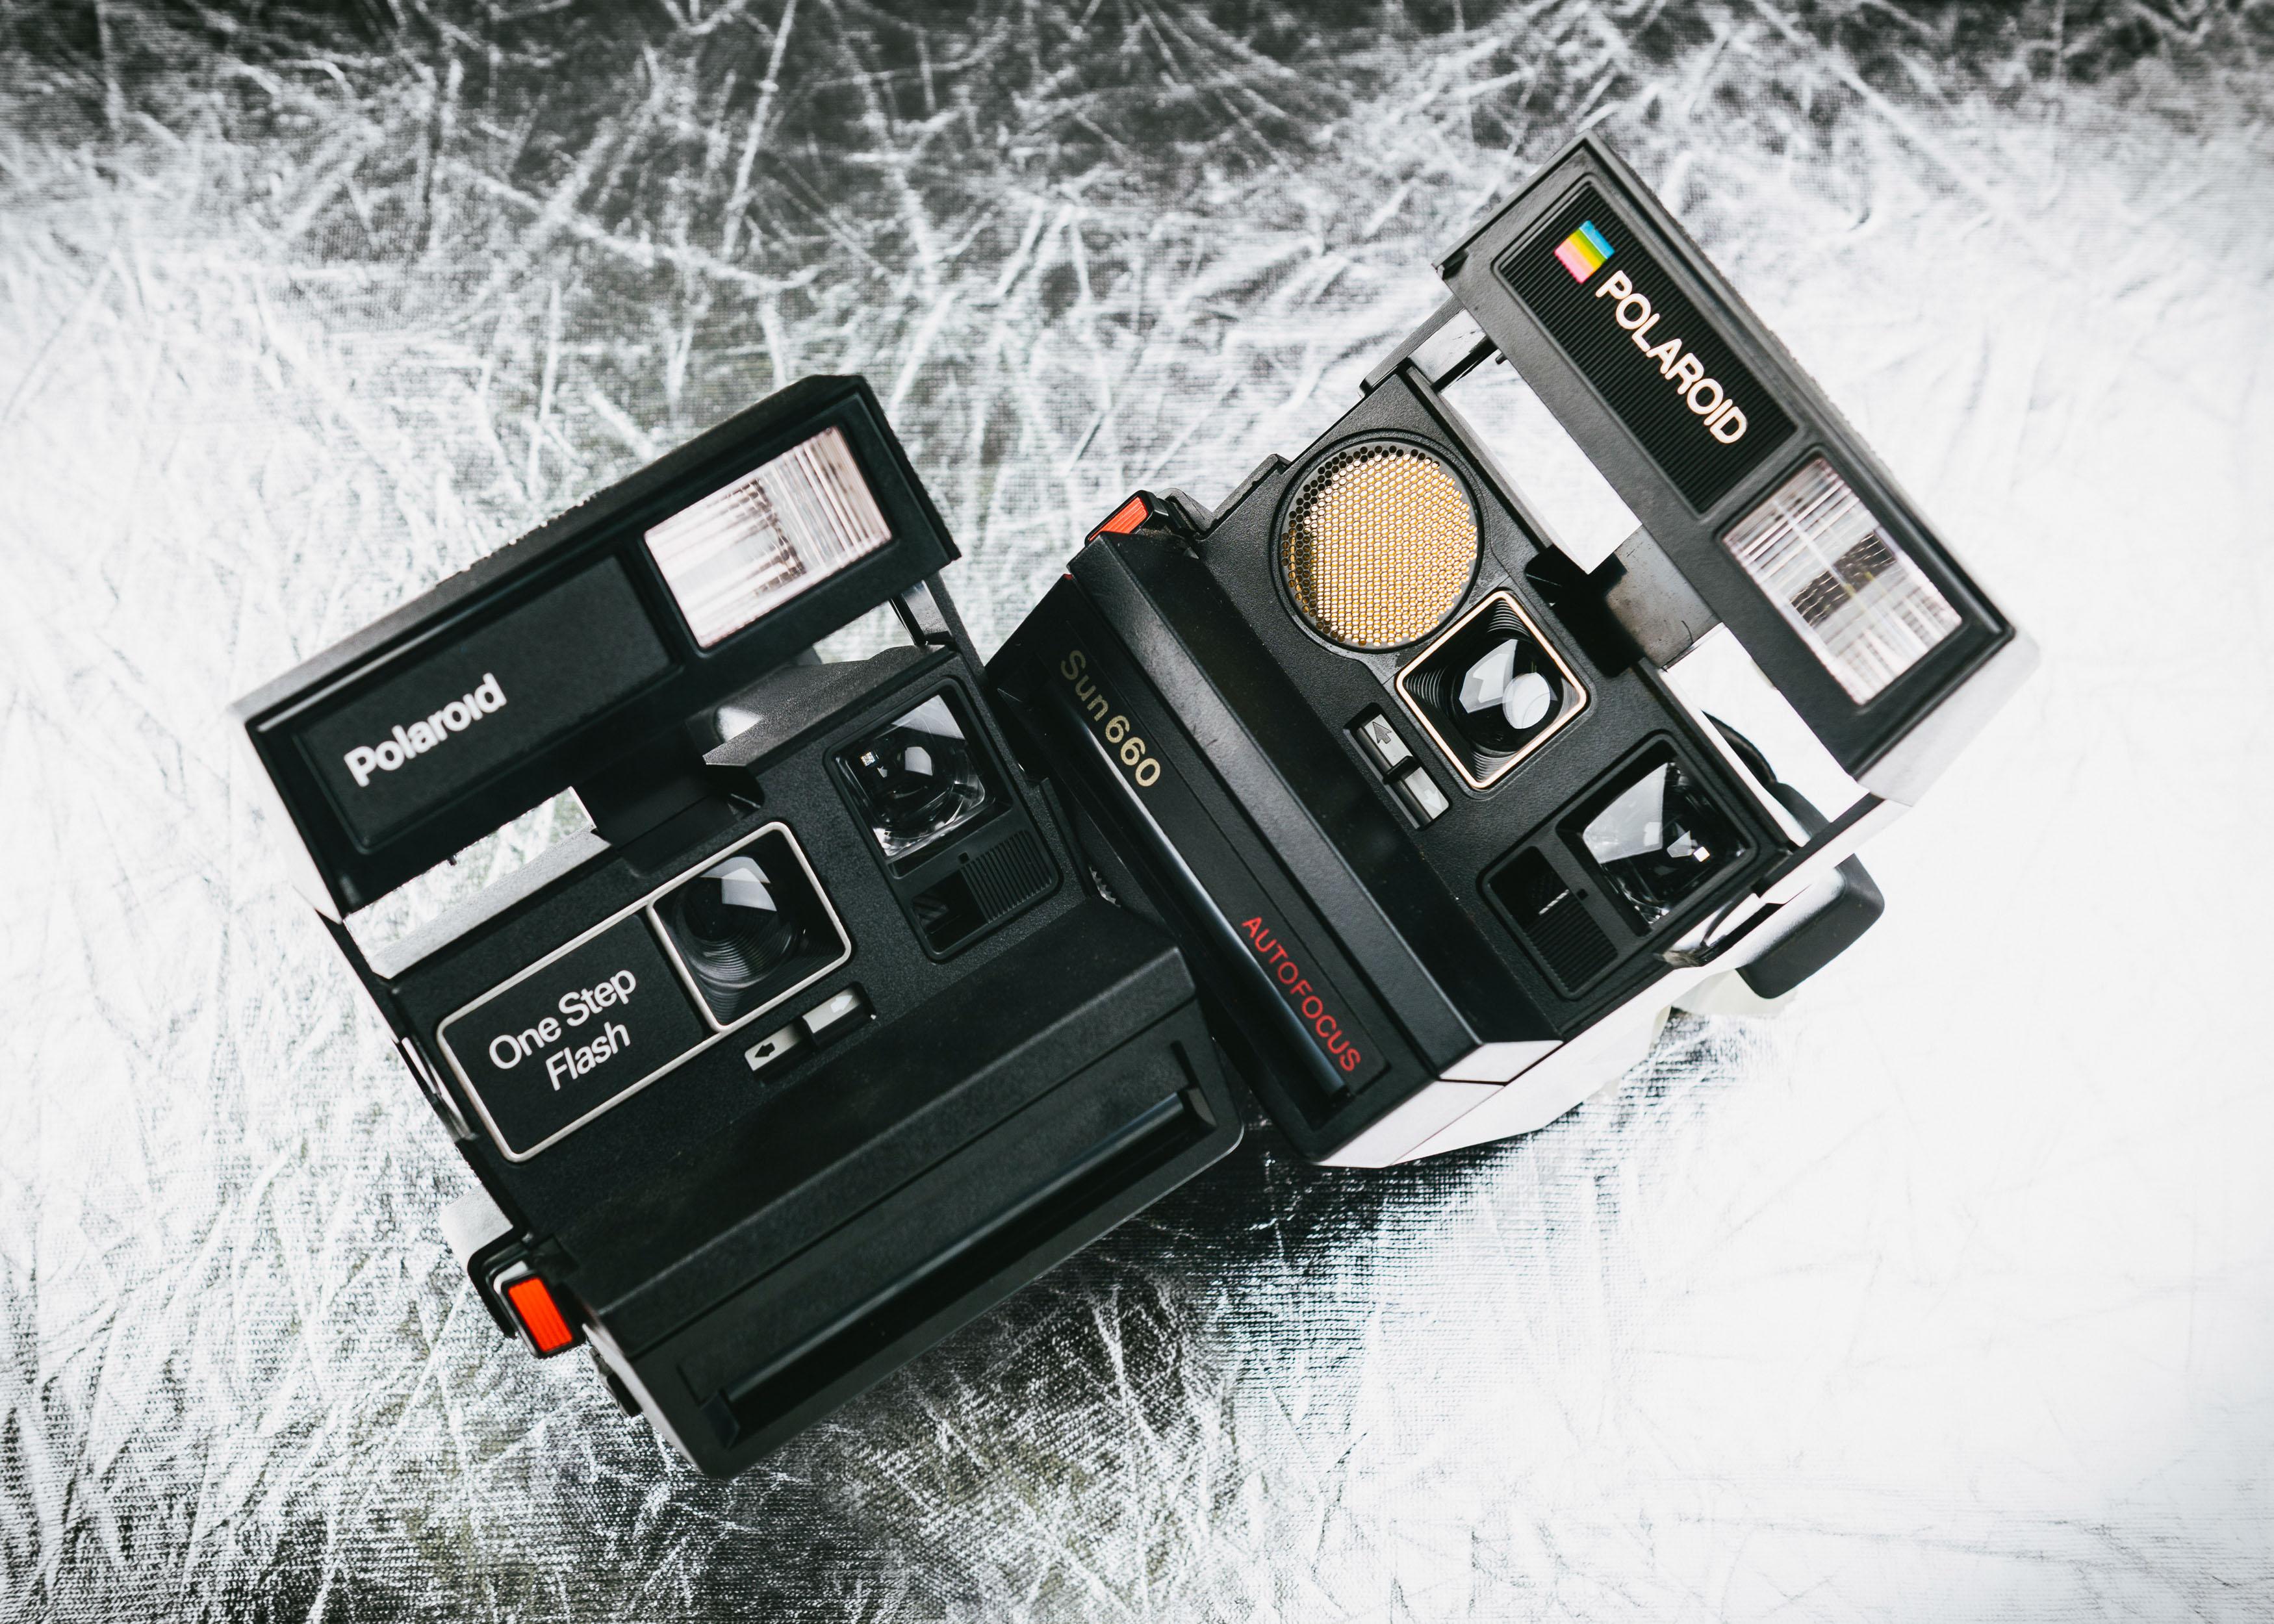 Kamera7748-Bearbeitet